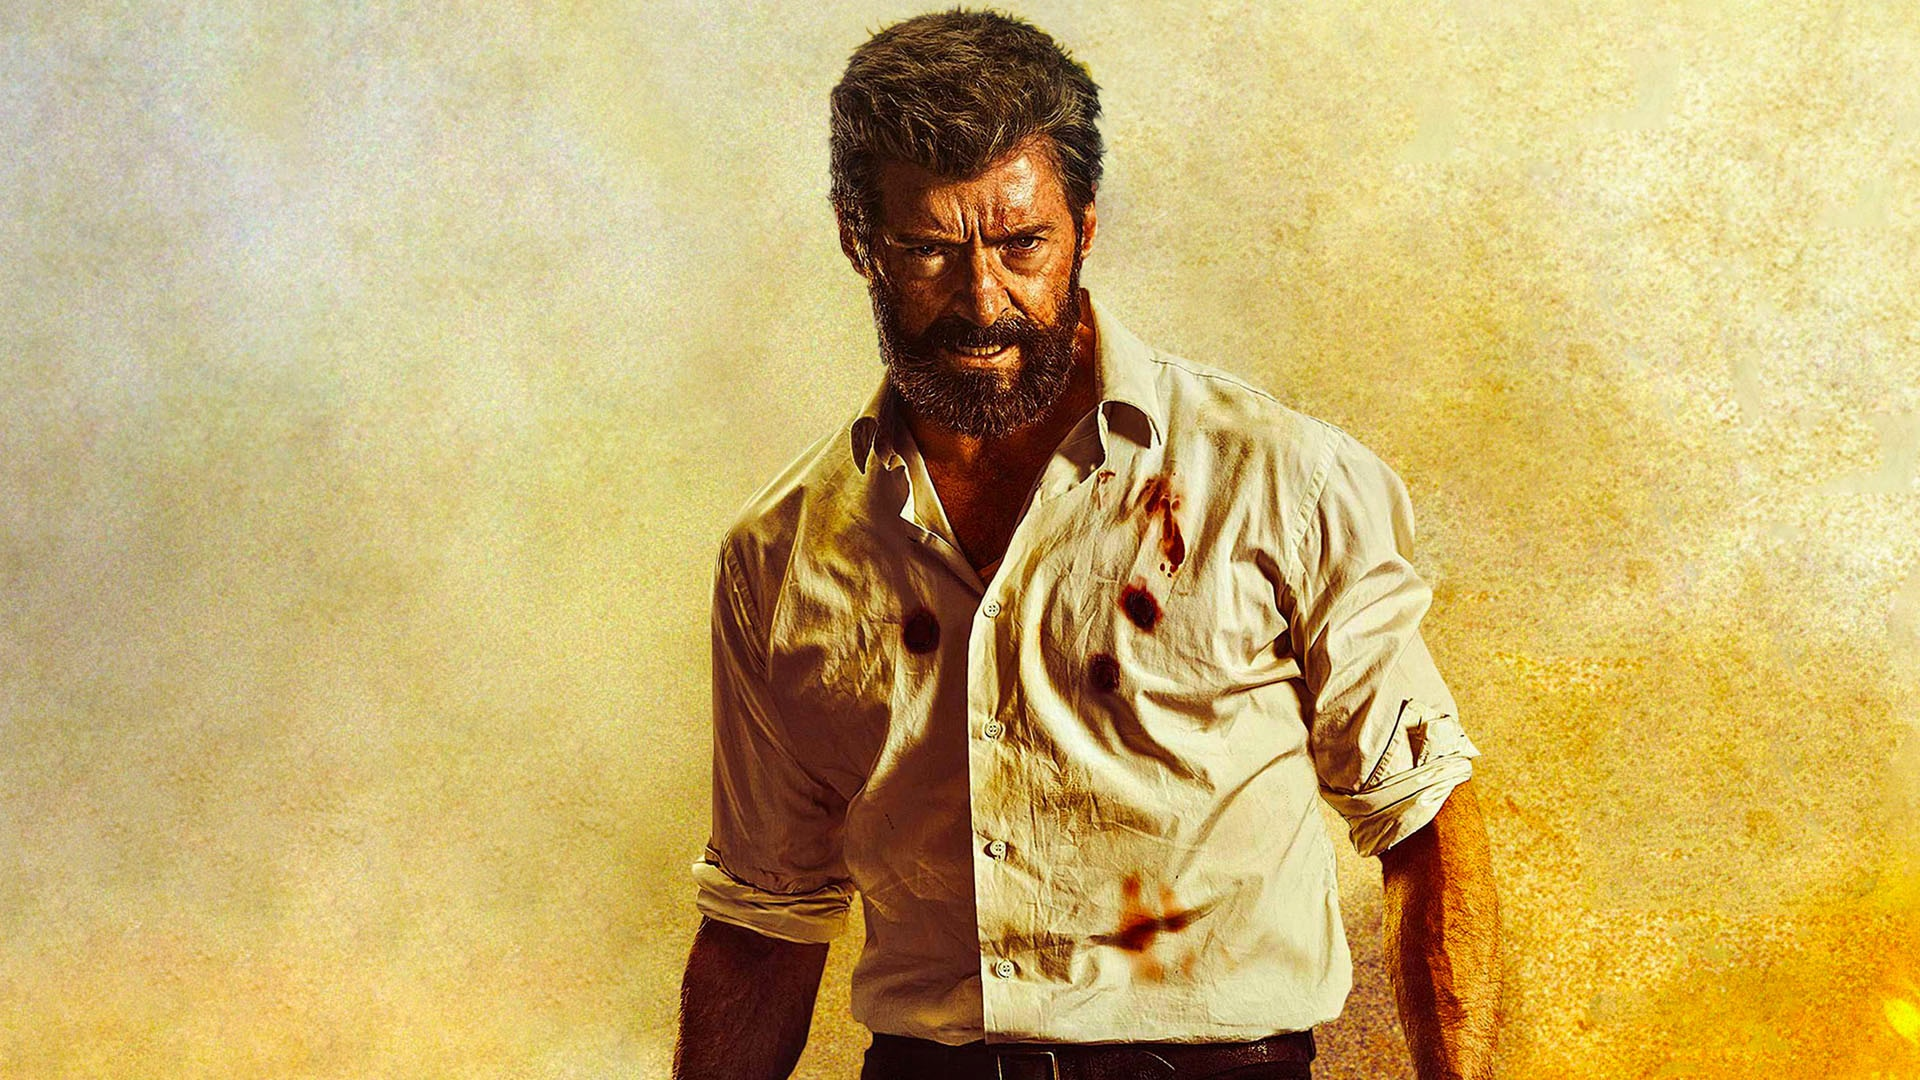 Logan | Logan Movie 2017 | Hollywood News 2017